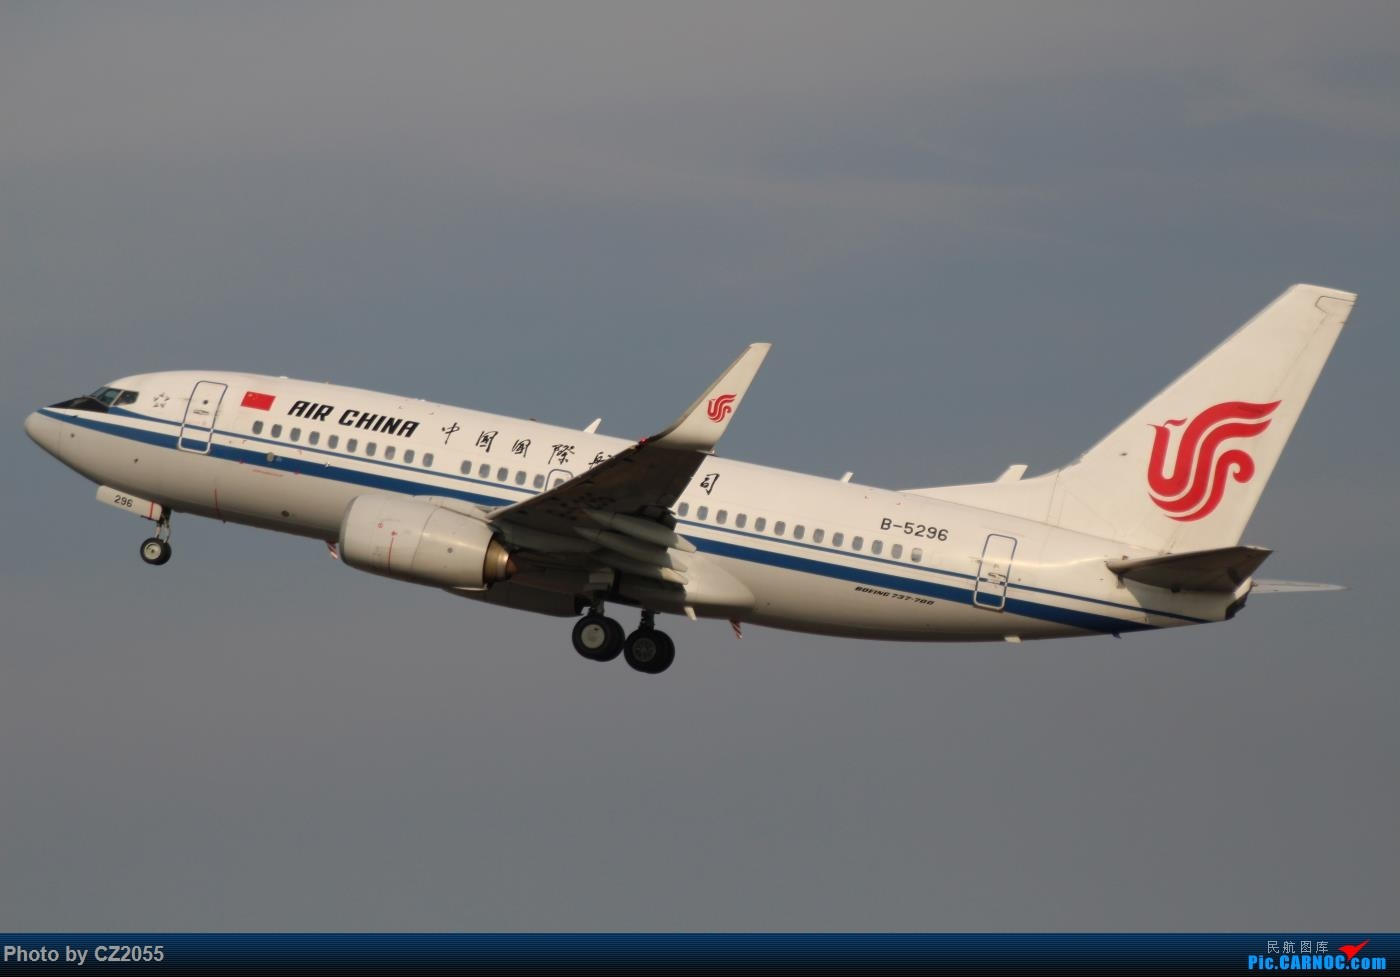 Re:[原创][原创]【CZ2055】【CAN】新镜头试镜。 BOEING 737-700 B-5296 中国